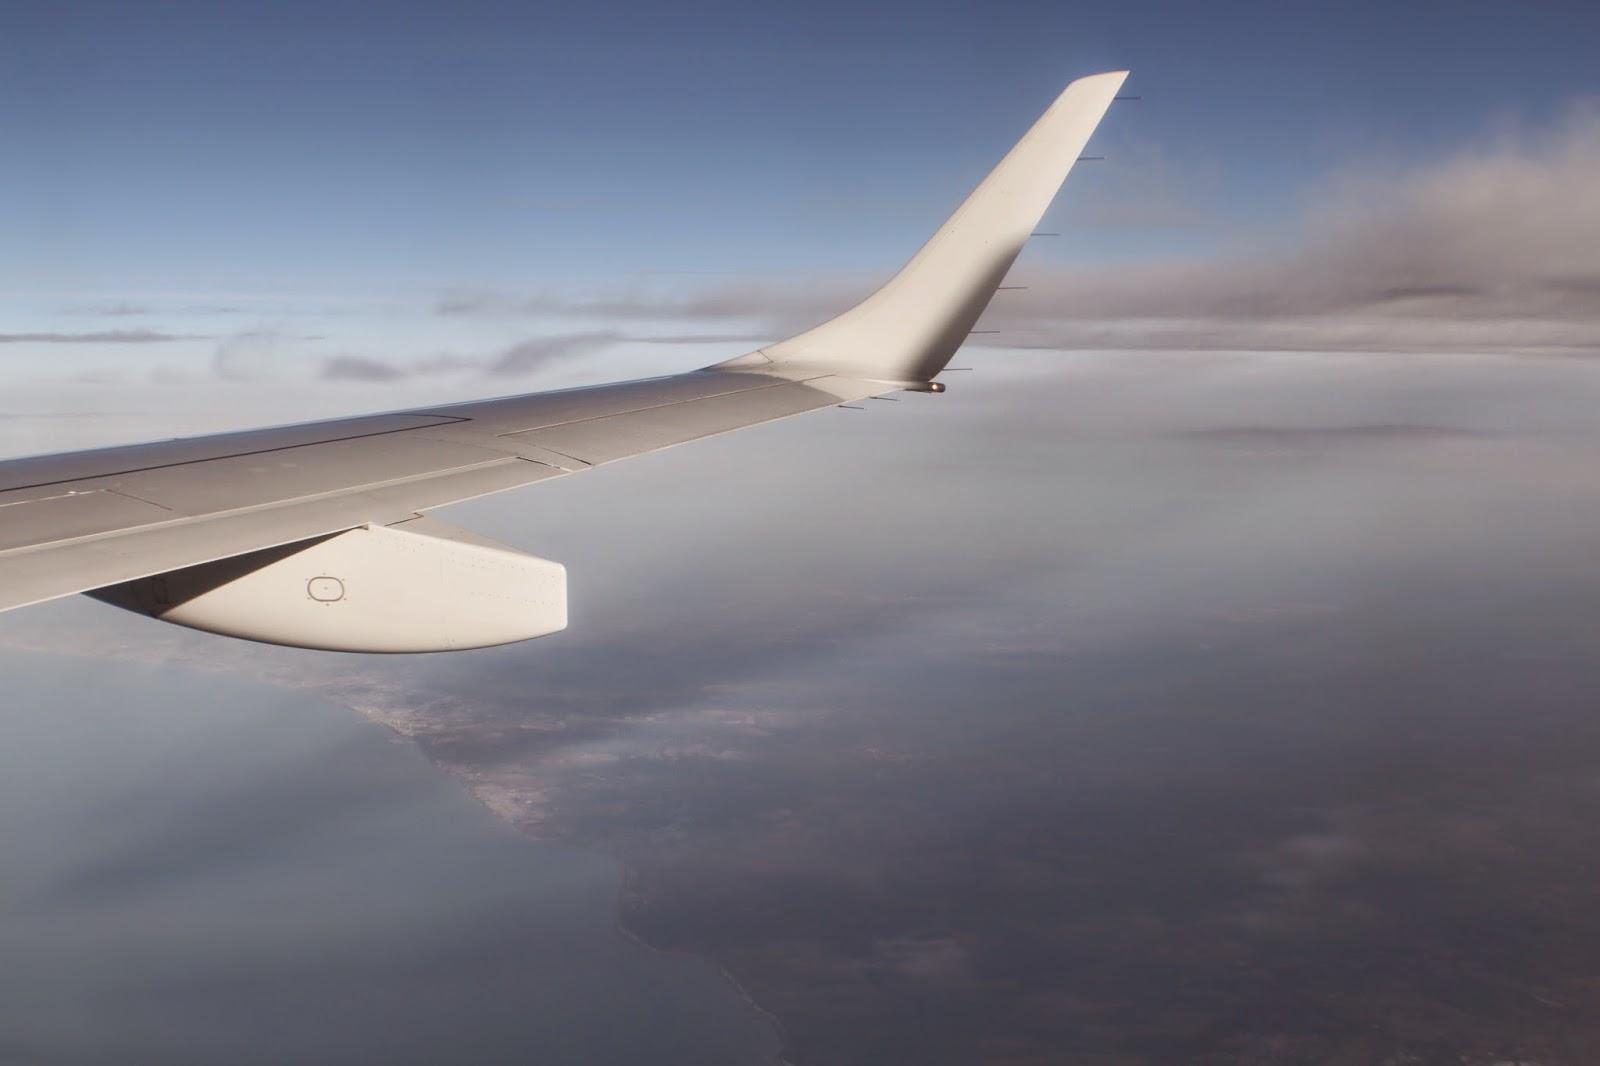 Miraculous My First Flight With Ryanair Smashleighjayne Dailytribune Chair Design For Home Dailytribuneorg